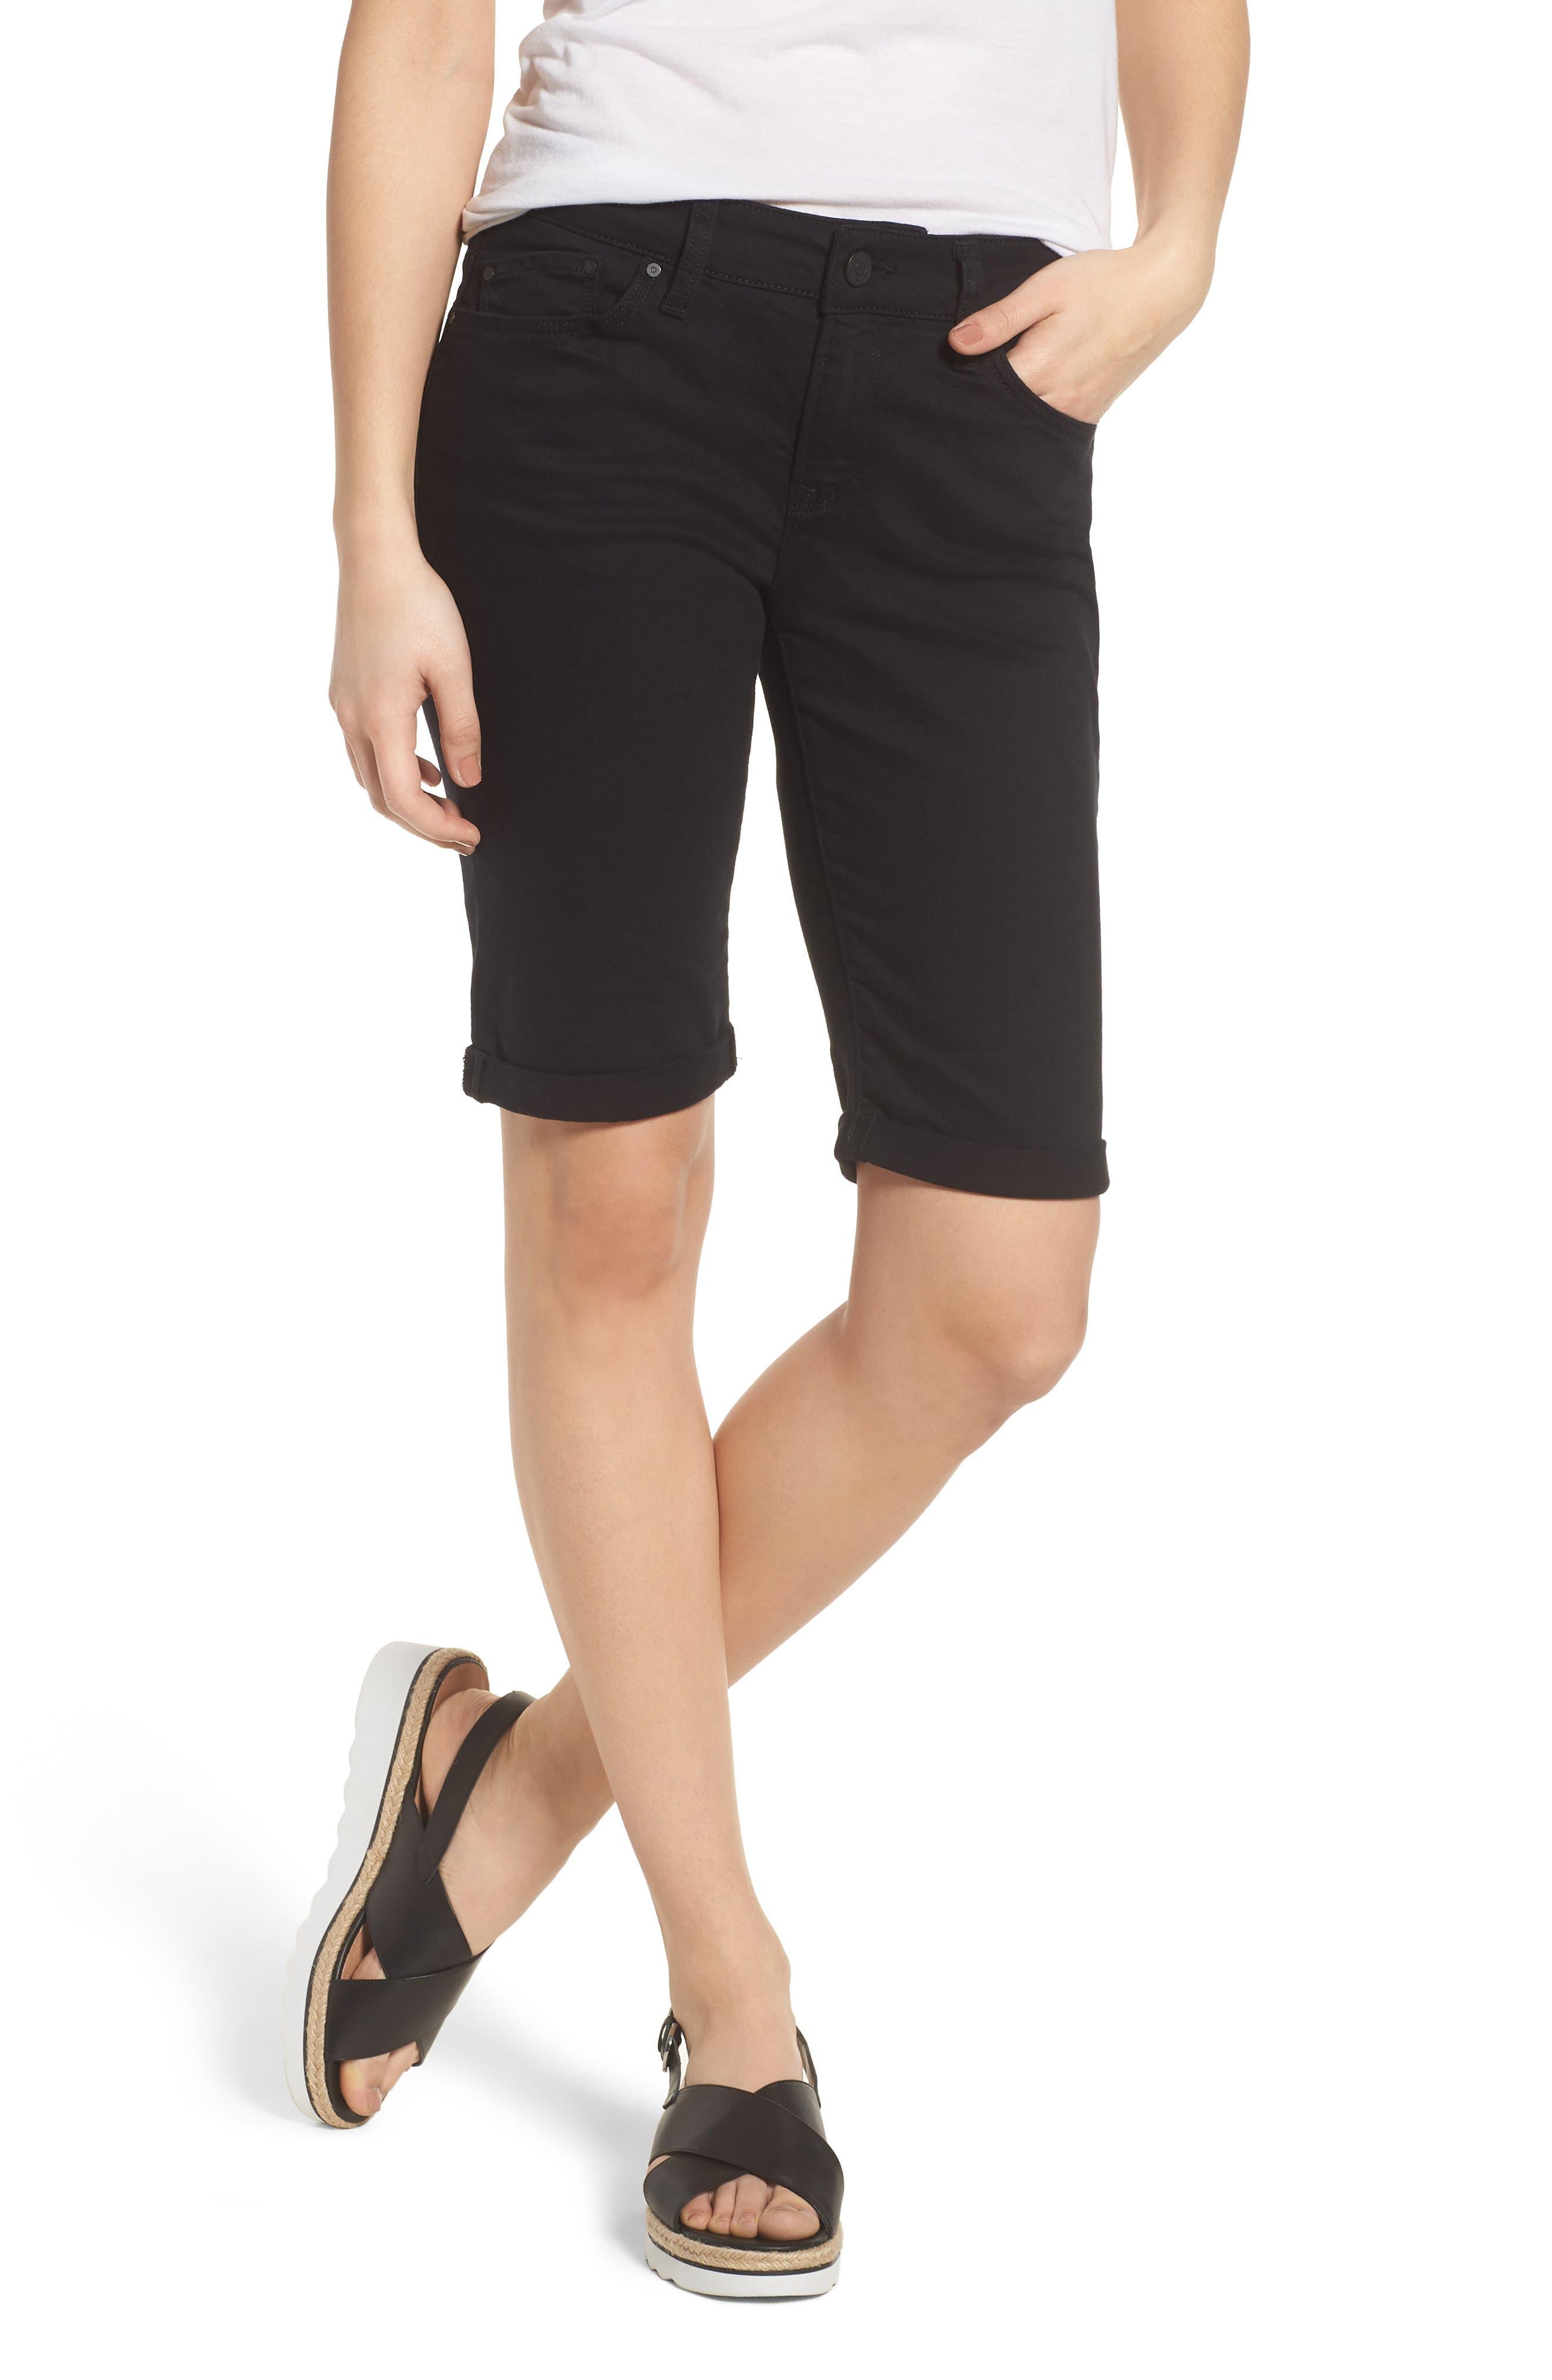 Mavi Jeans Karly Black Nolita Roll Cuff Bermuda Shorts